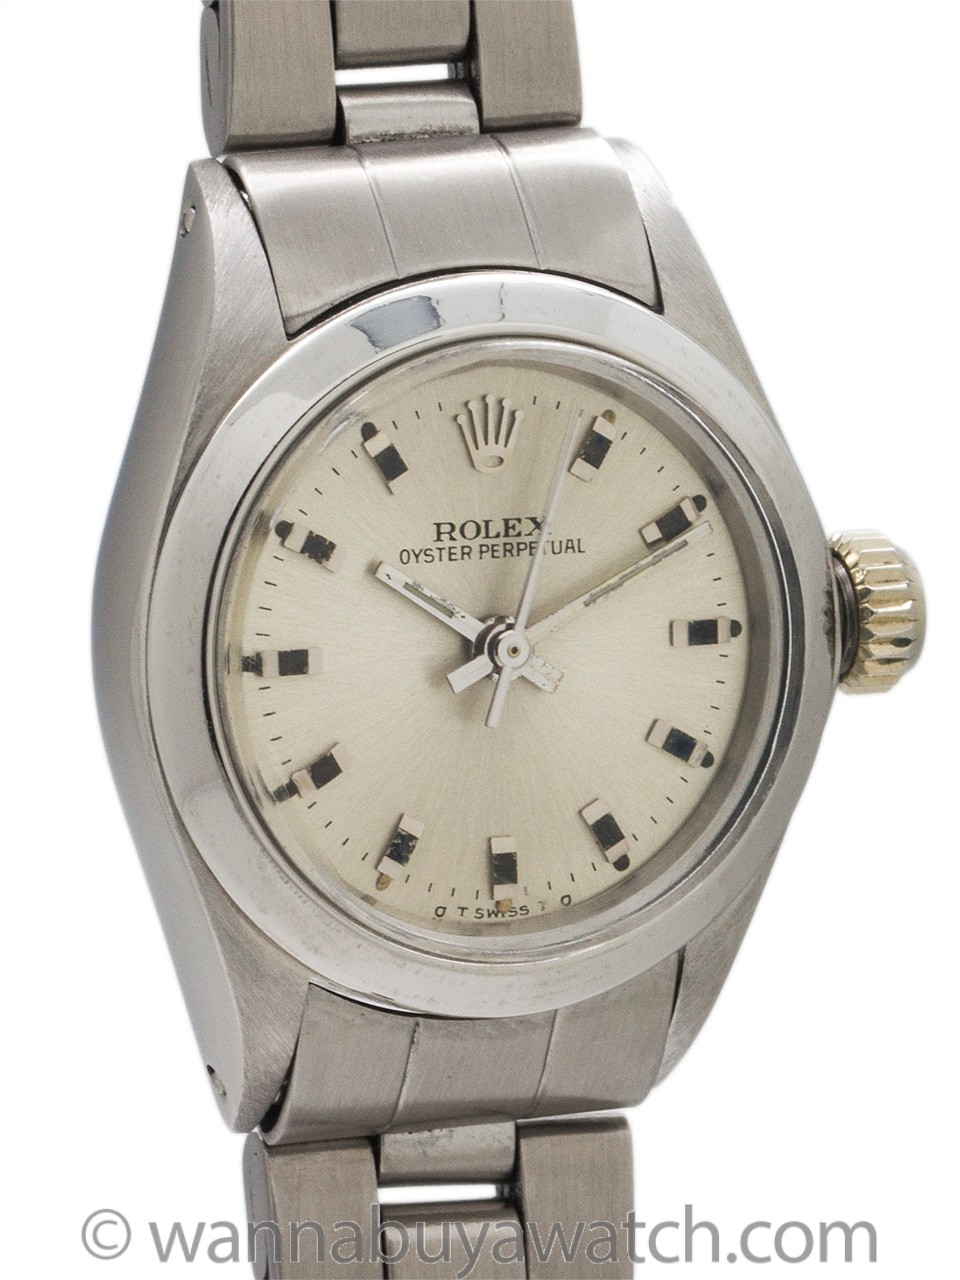 Lady Rolex Oyster Perpetual ref 6723 circa 1979